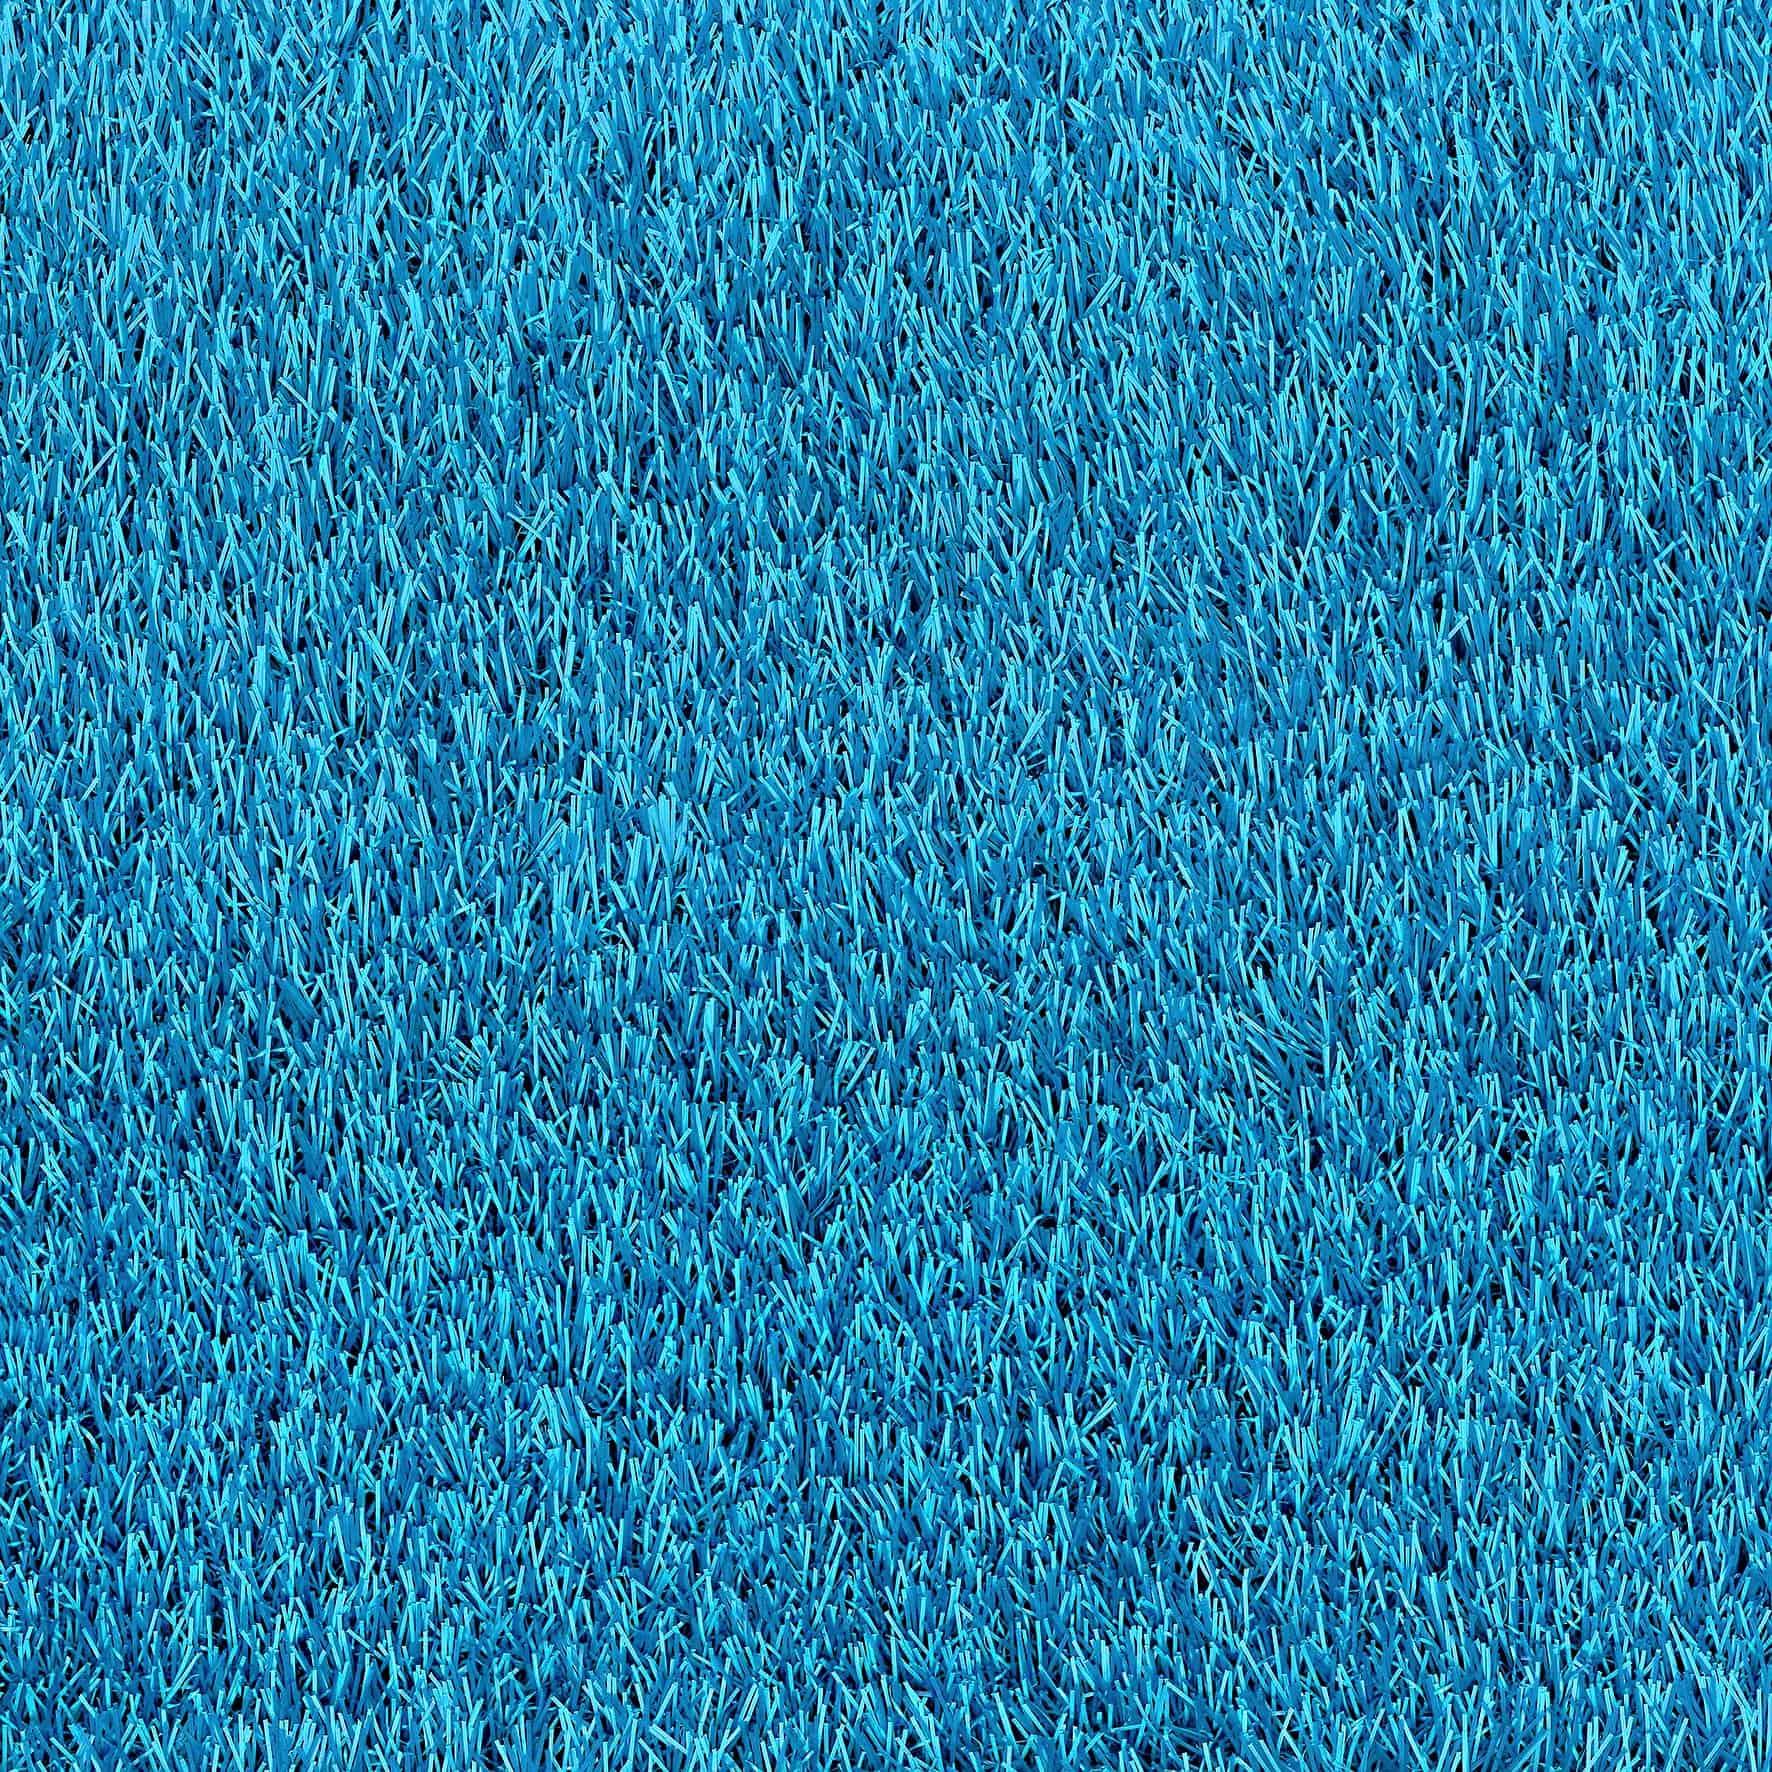 02 Woc Hawaiian Blue Top View High Res